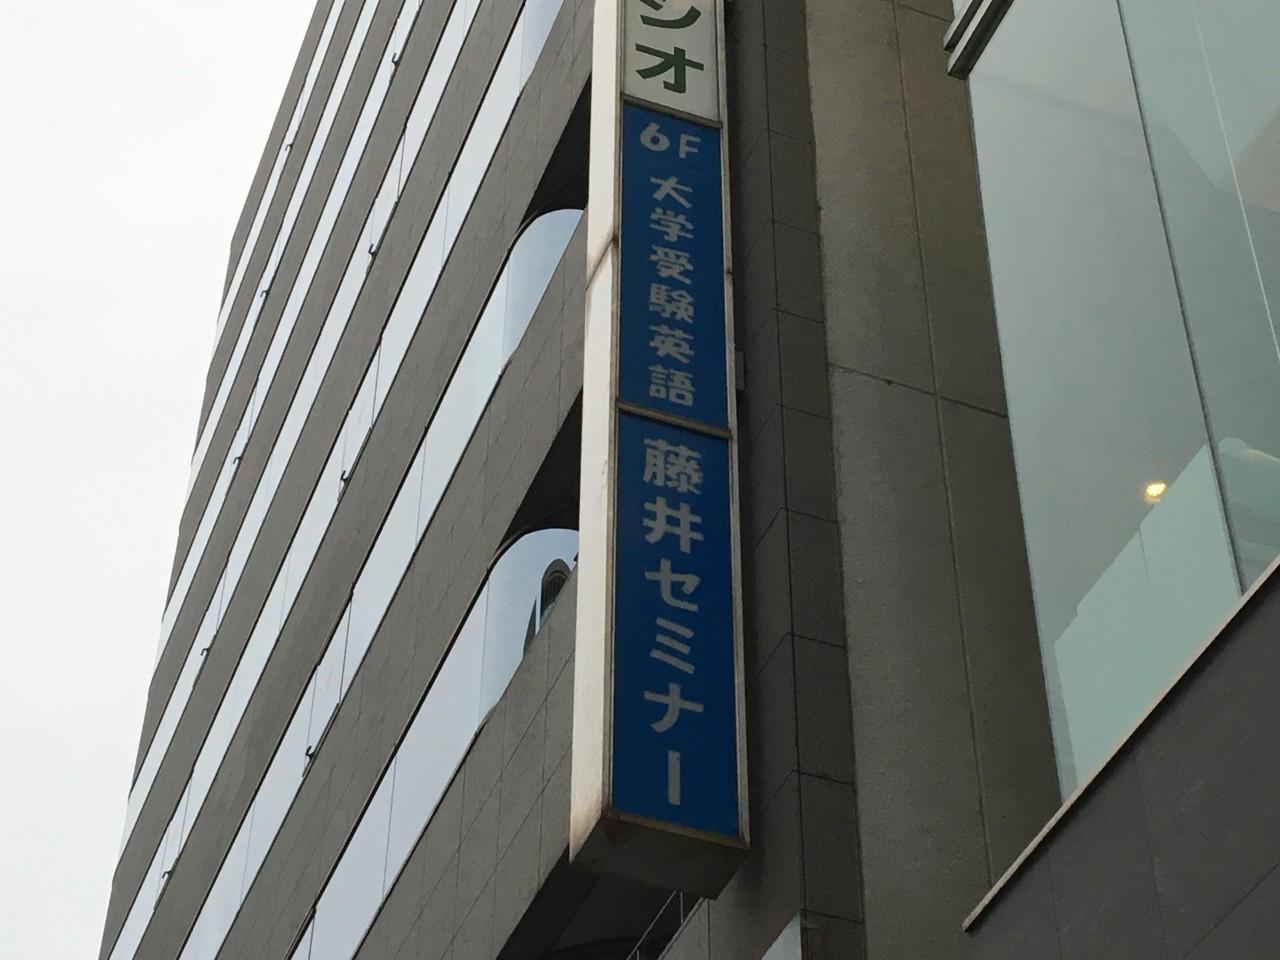 藤井セミナー 予備校 大学受験 塾 評判 三ノ宮 三宮